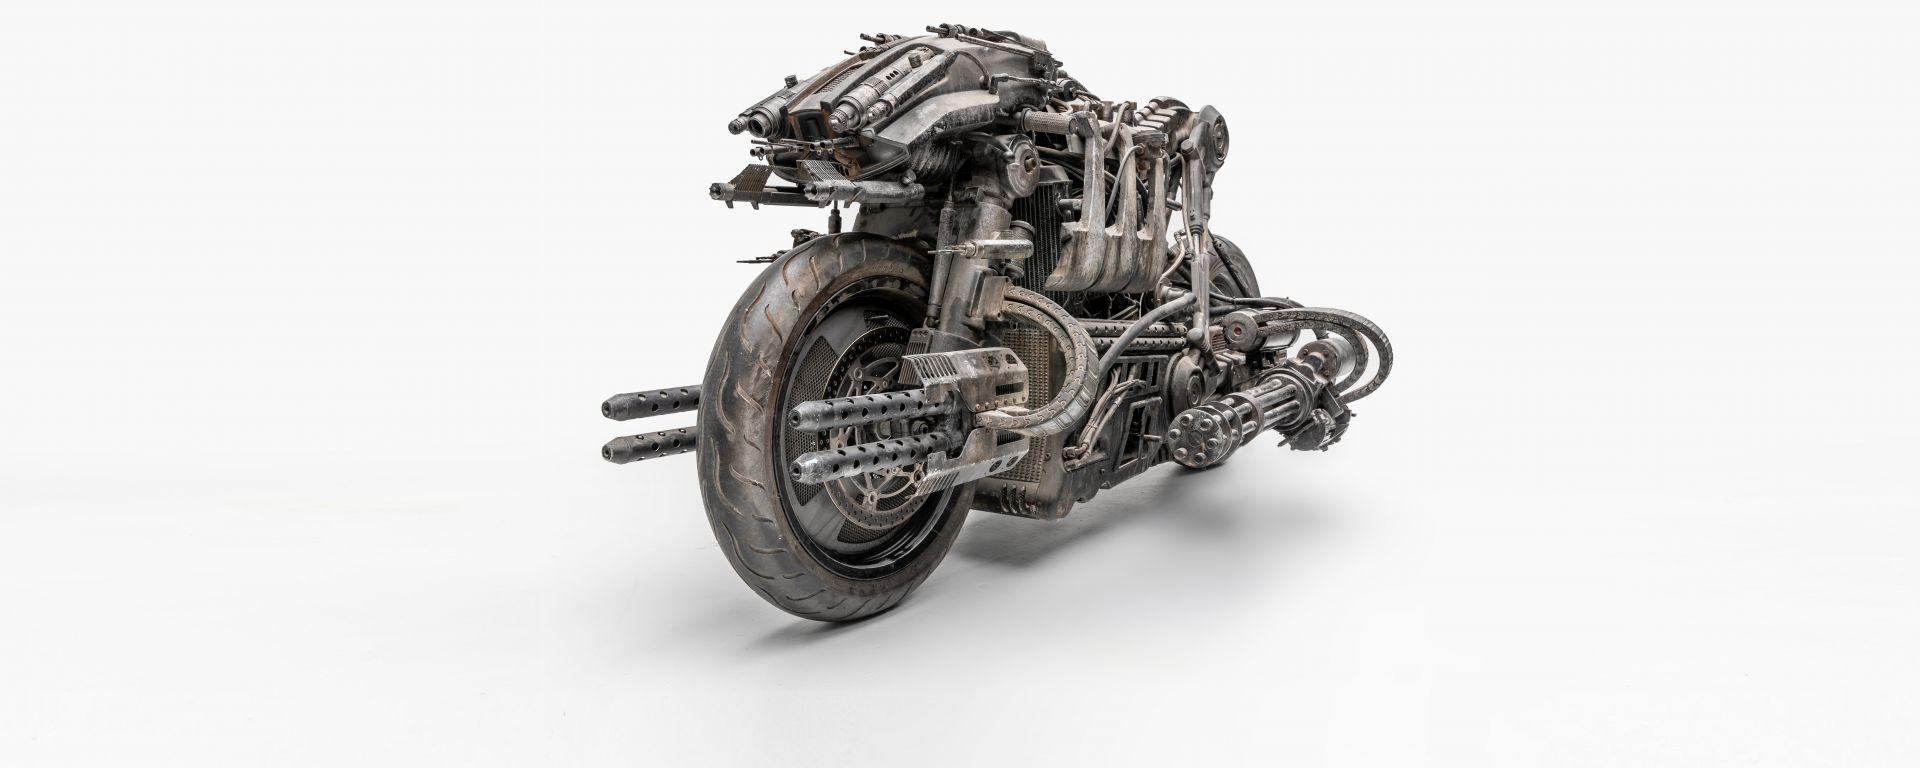 Ducati Hypermotard Terminator Salvation 2009: la vista anteriore